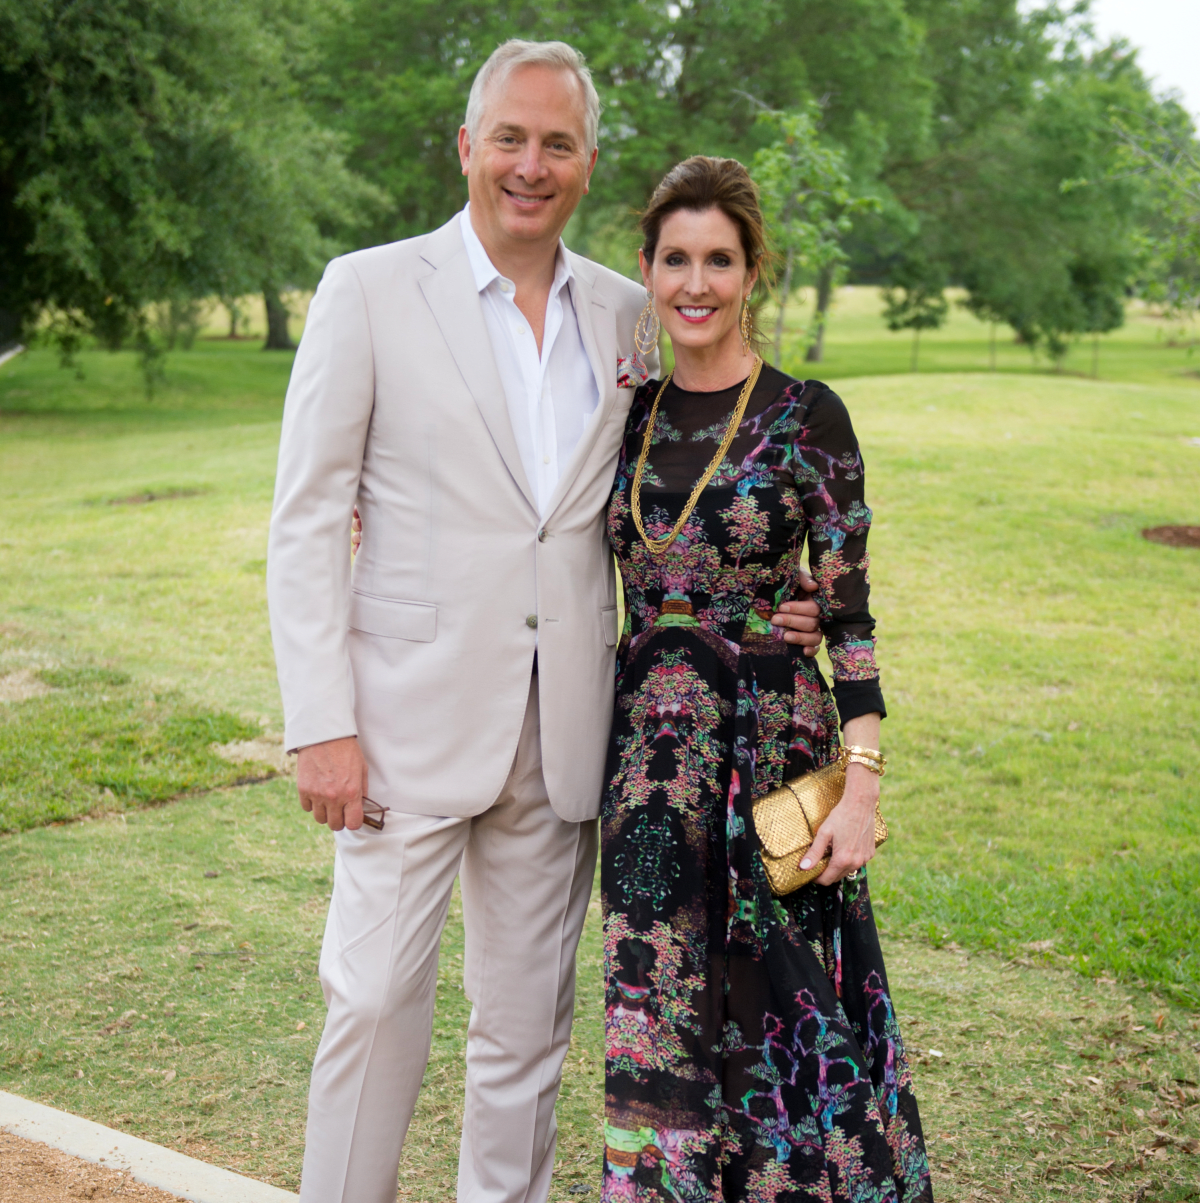 Houston, Hermann Park's  Evening in the Park 2017, May 2017, Bobby Tudor, Phoebe Tudor